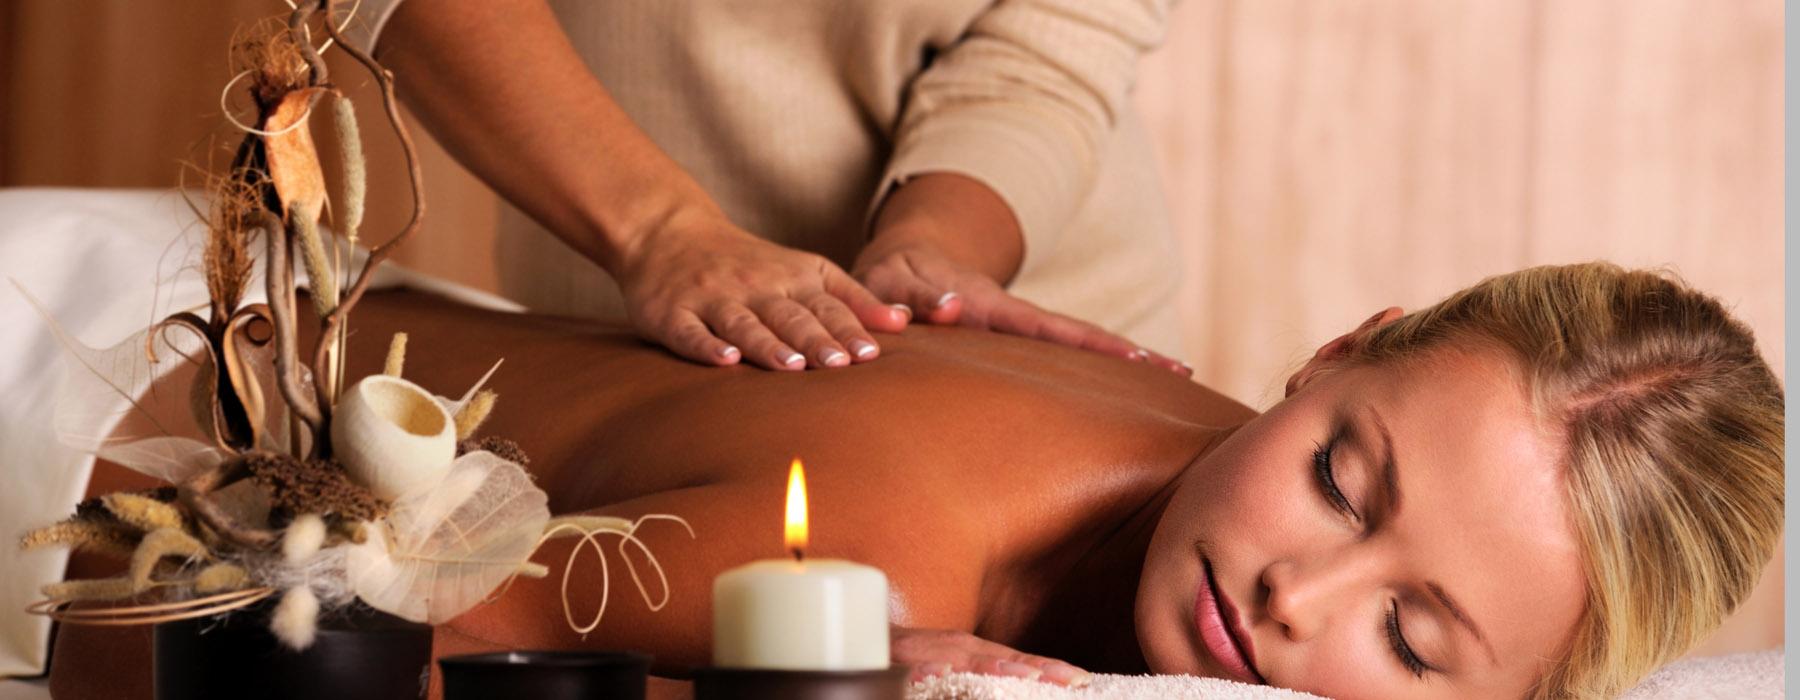 Baño con masaje doble